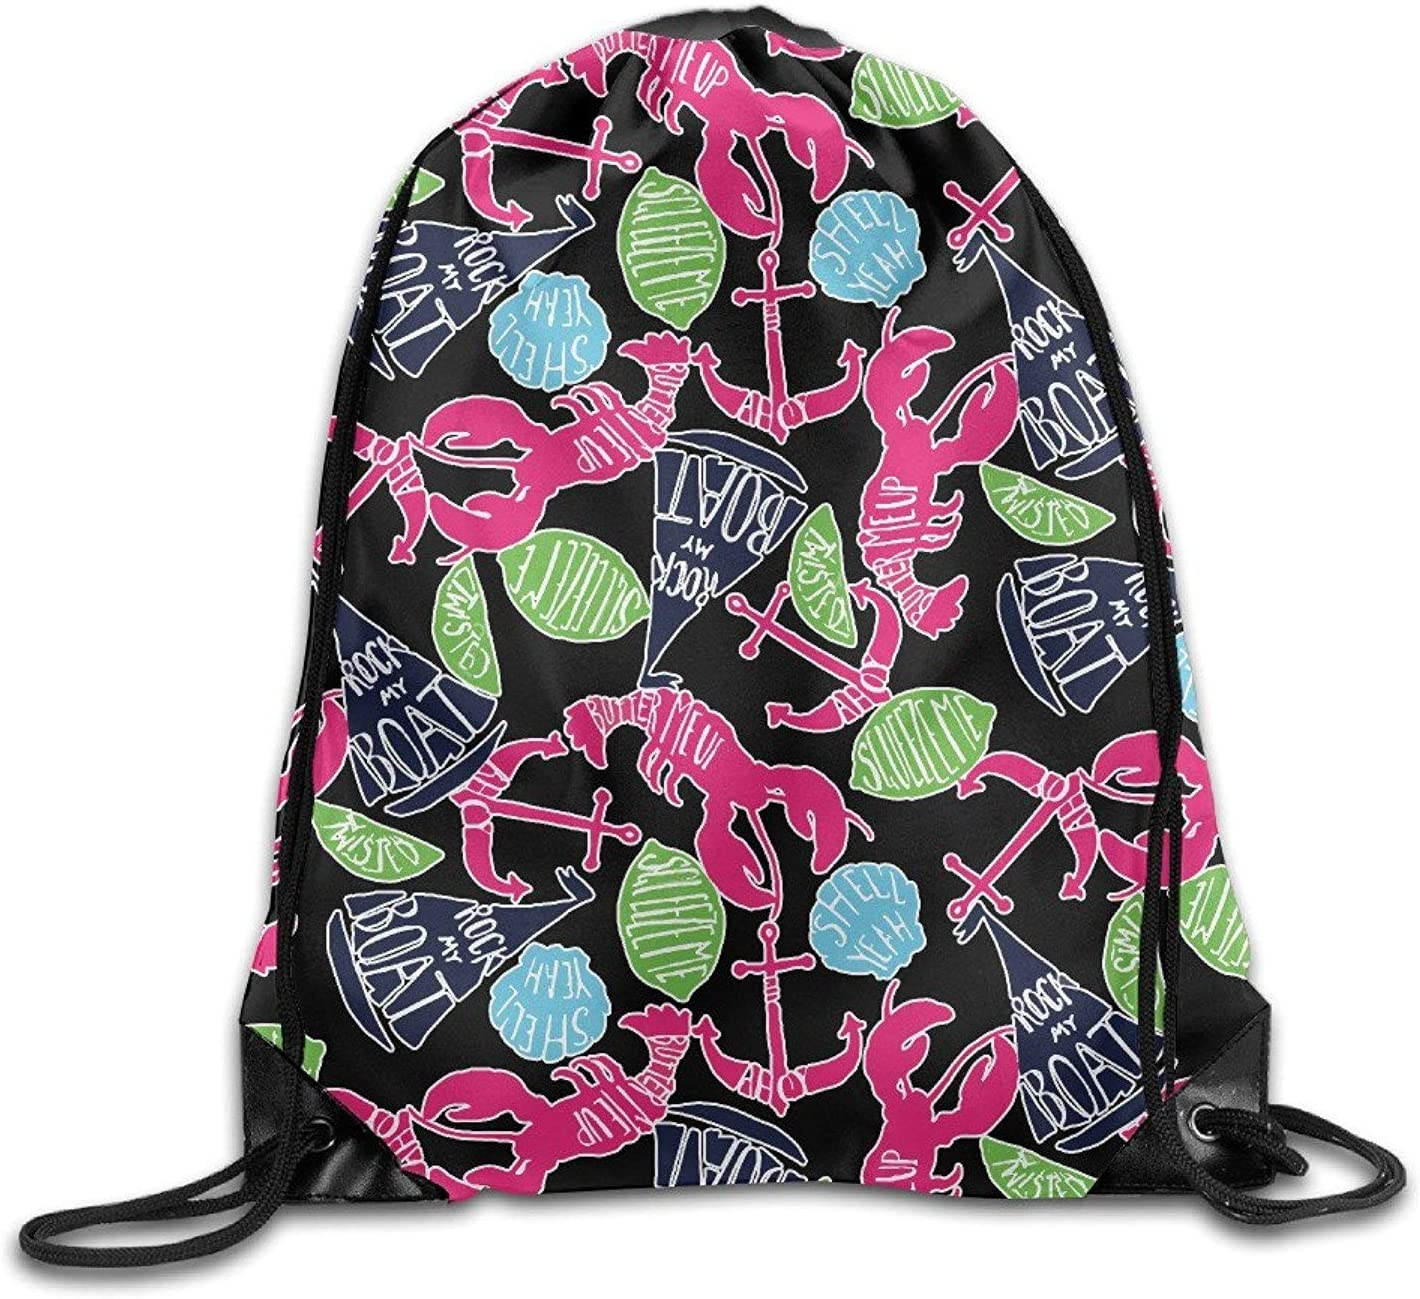 Etryrt Premium Drawstring Bag Cute Wallpapers Iphone 5 Wallpaper Unisex Drawstring Backpack Travel Sports Bag Drawstring Beam Port Backpack Amazon Co Uk Sports Outdoors